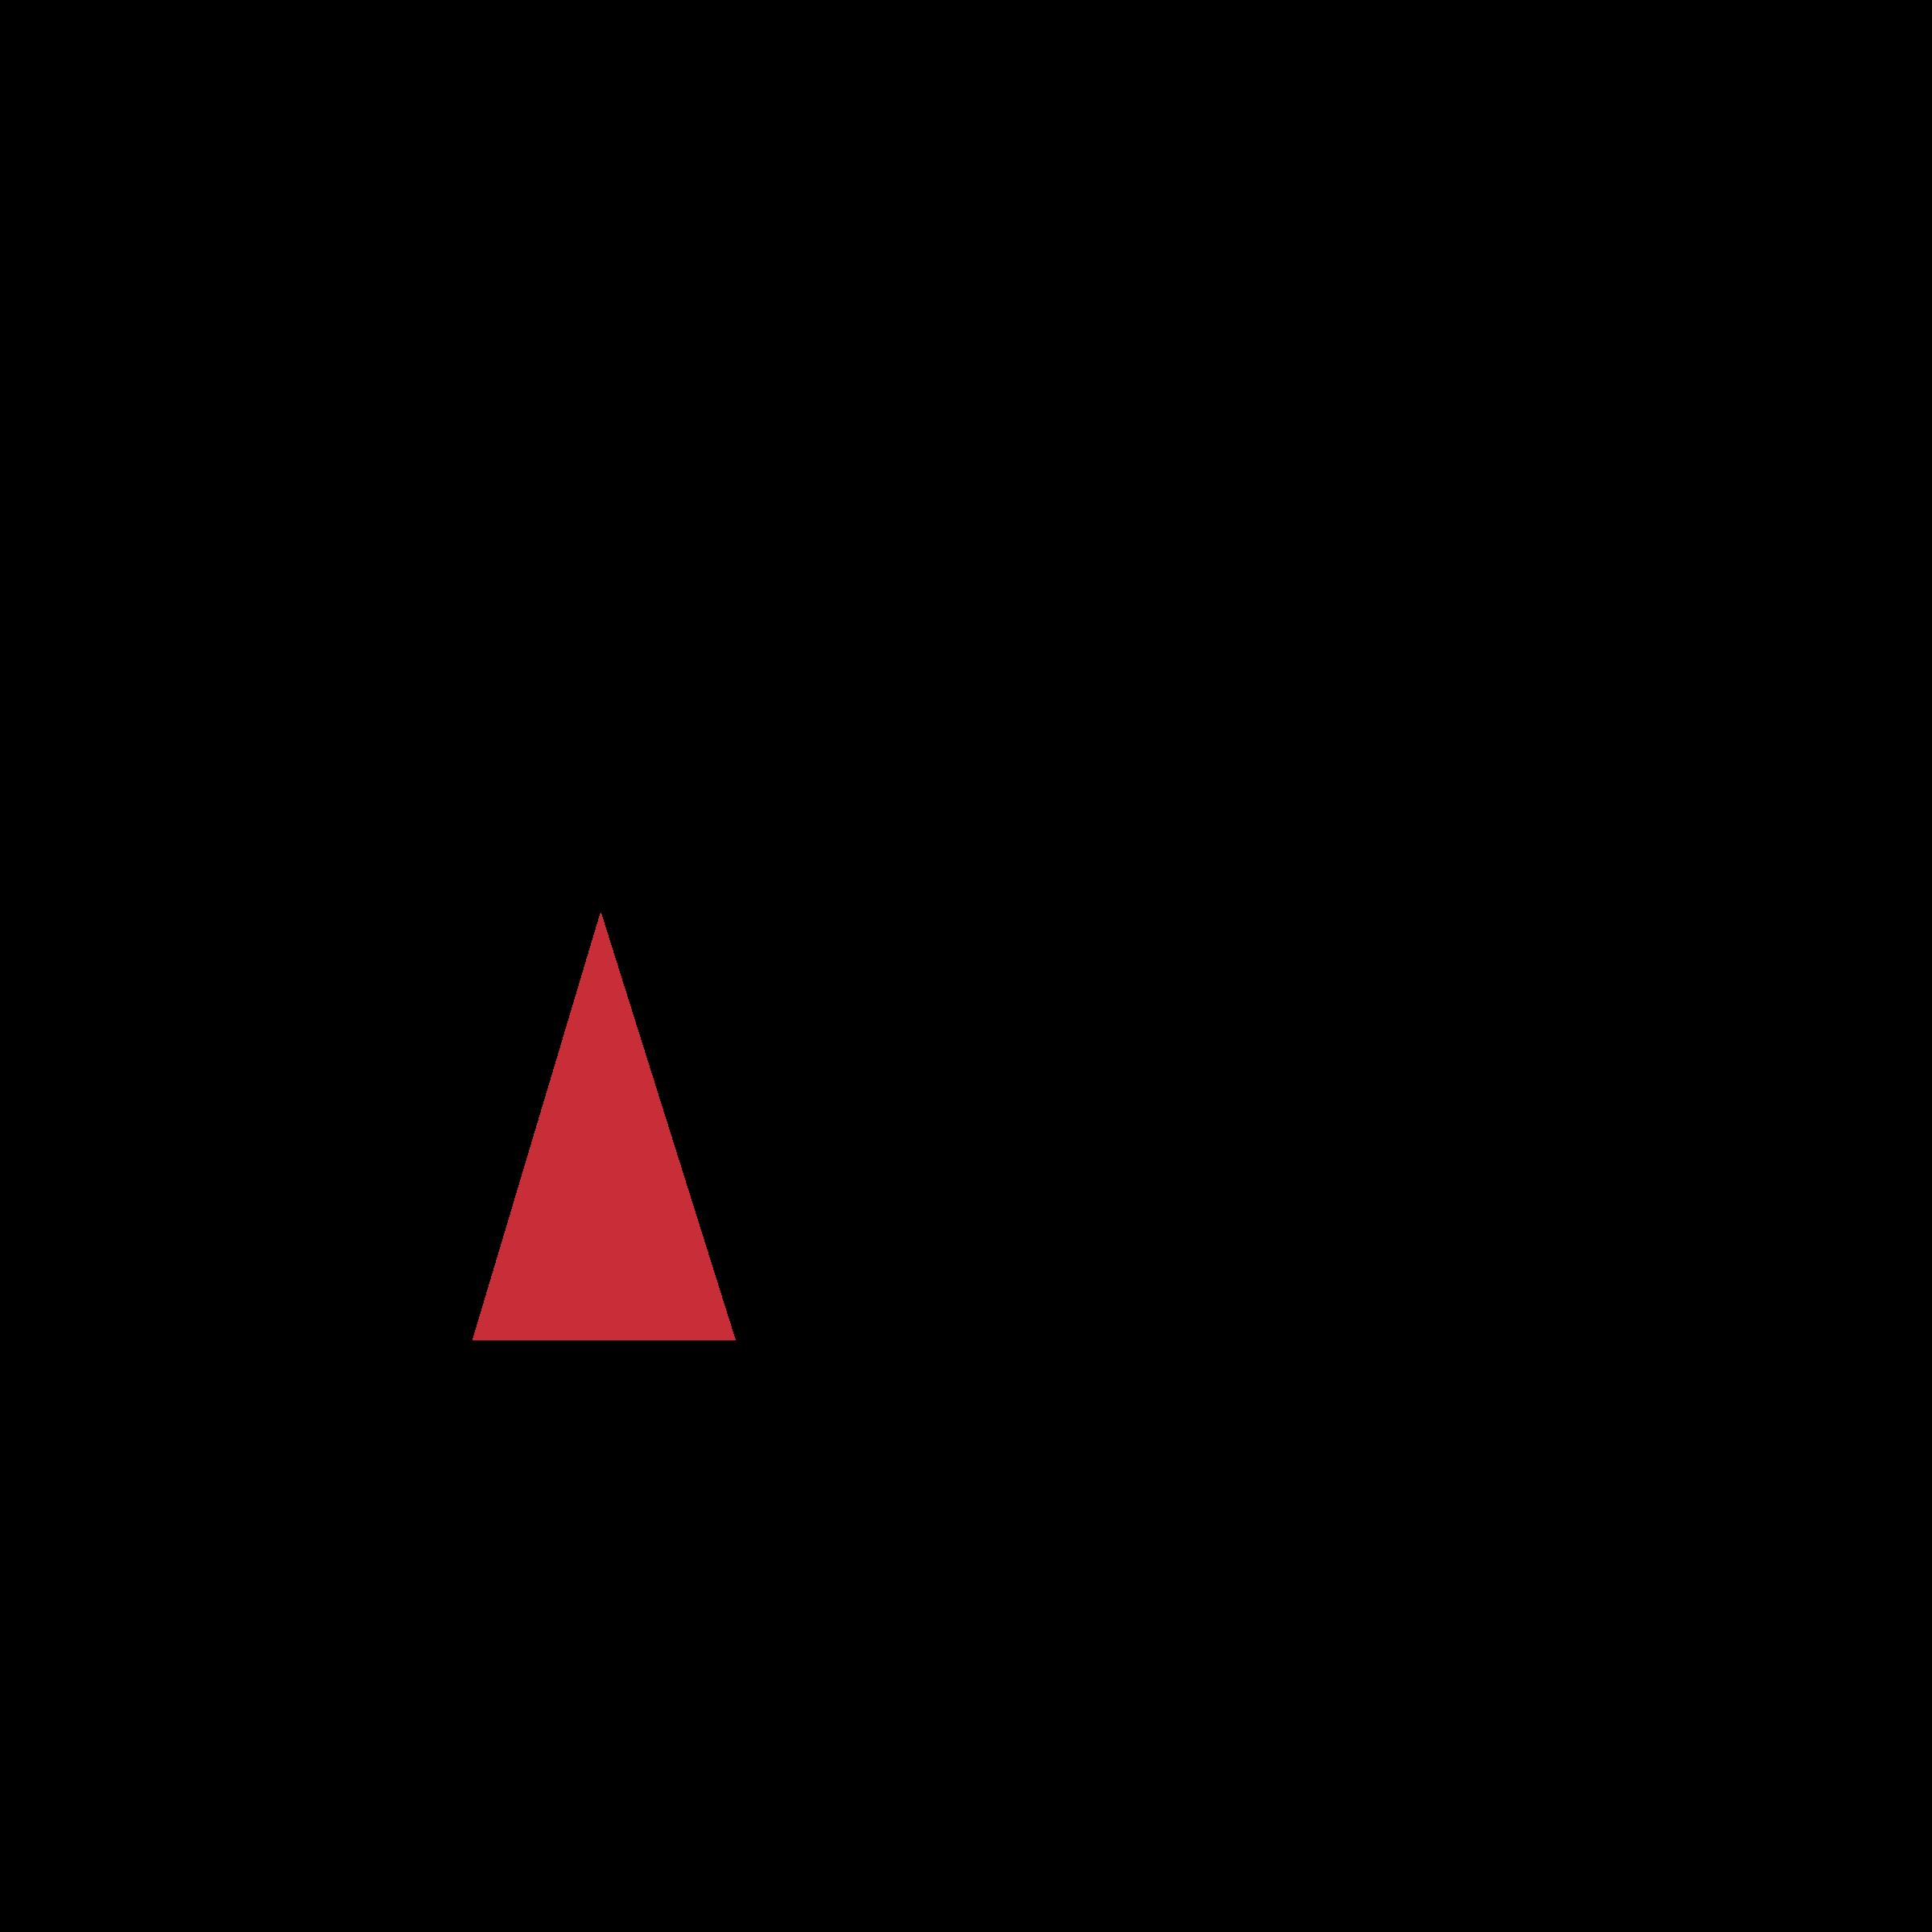 ACI Worldwide Logo PNG Transparent & SVG Vector.